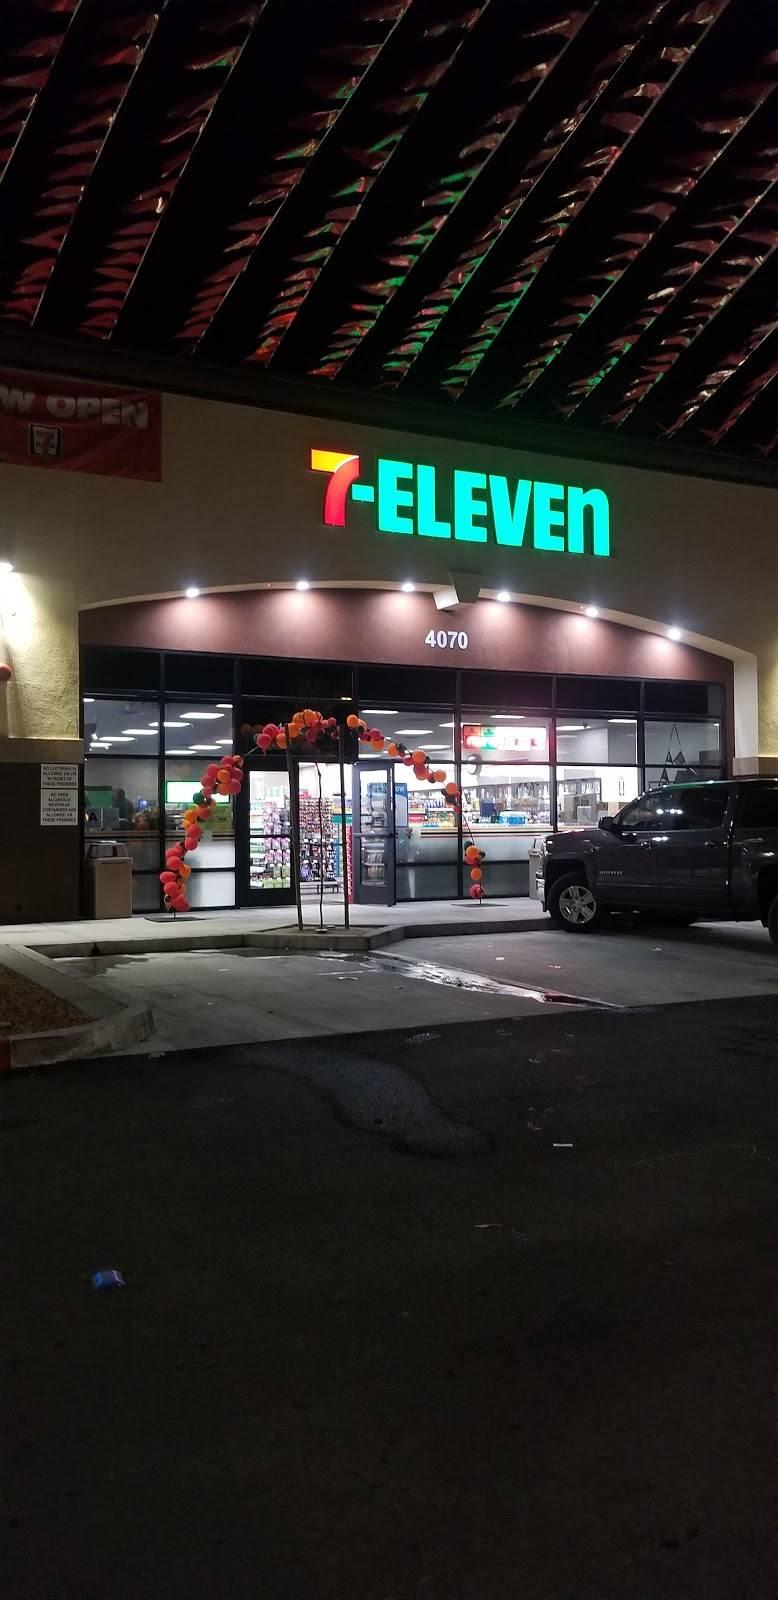 7-Eleven - convenience store  | Photo 1 of 7 | Address: 4070 Etiwanda Ave, Jurupa Valley, CA 91752, USA | Phone: (951) 258-2404